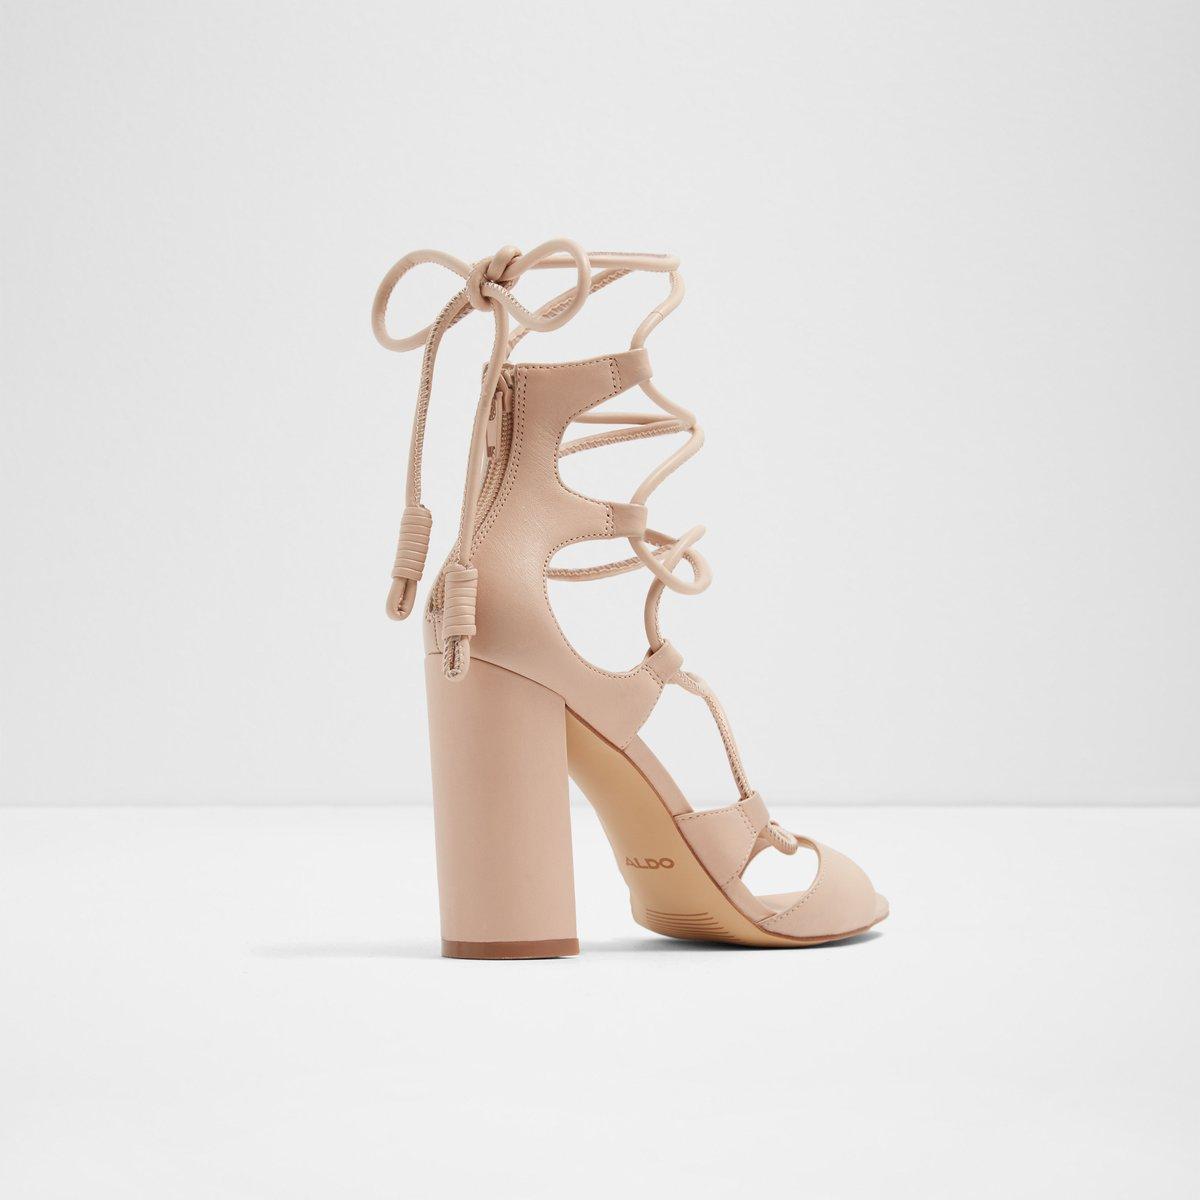 721c3727fbad Miadia Bone Women s Heeled sandals